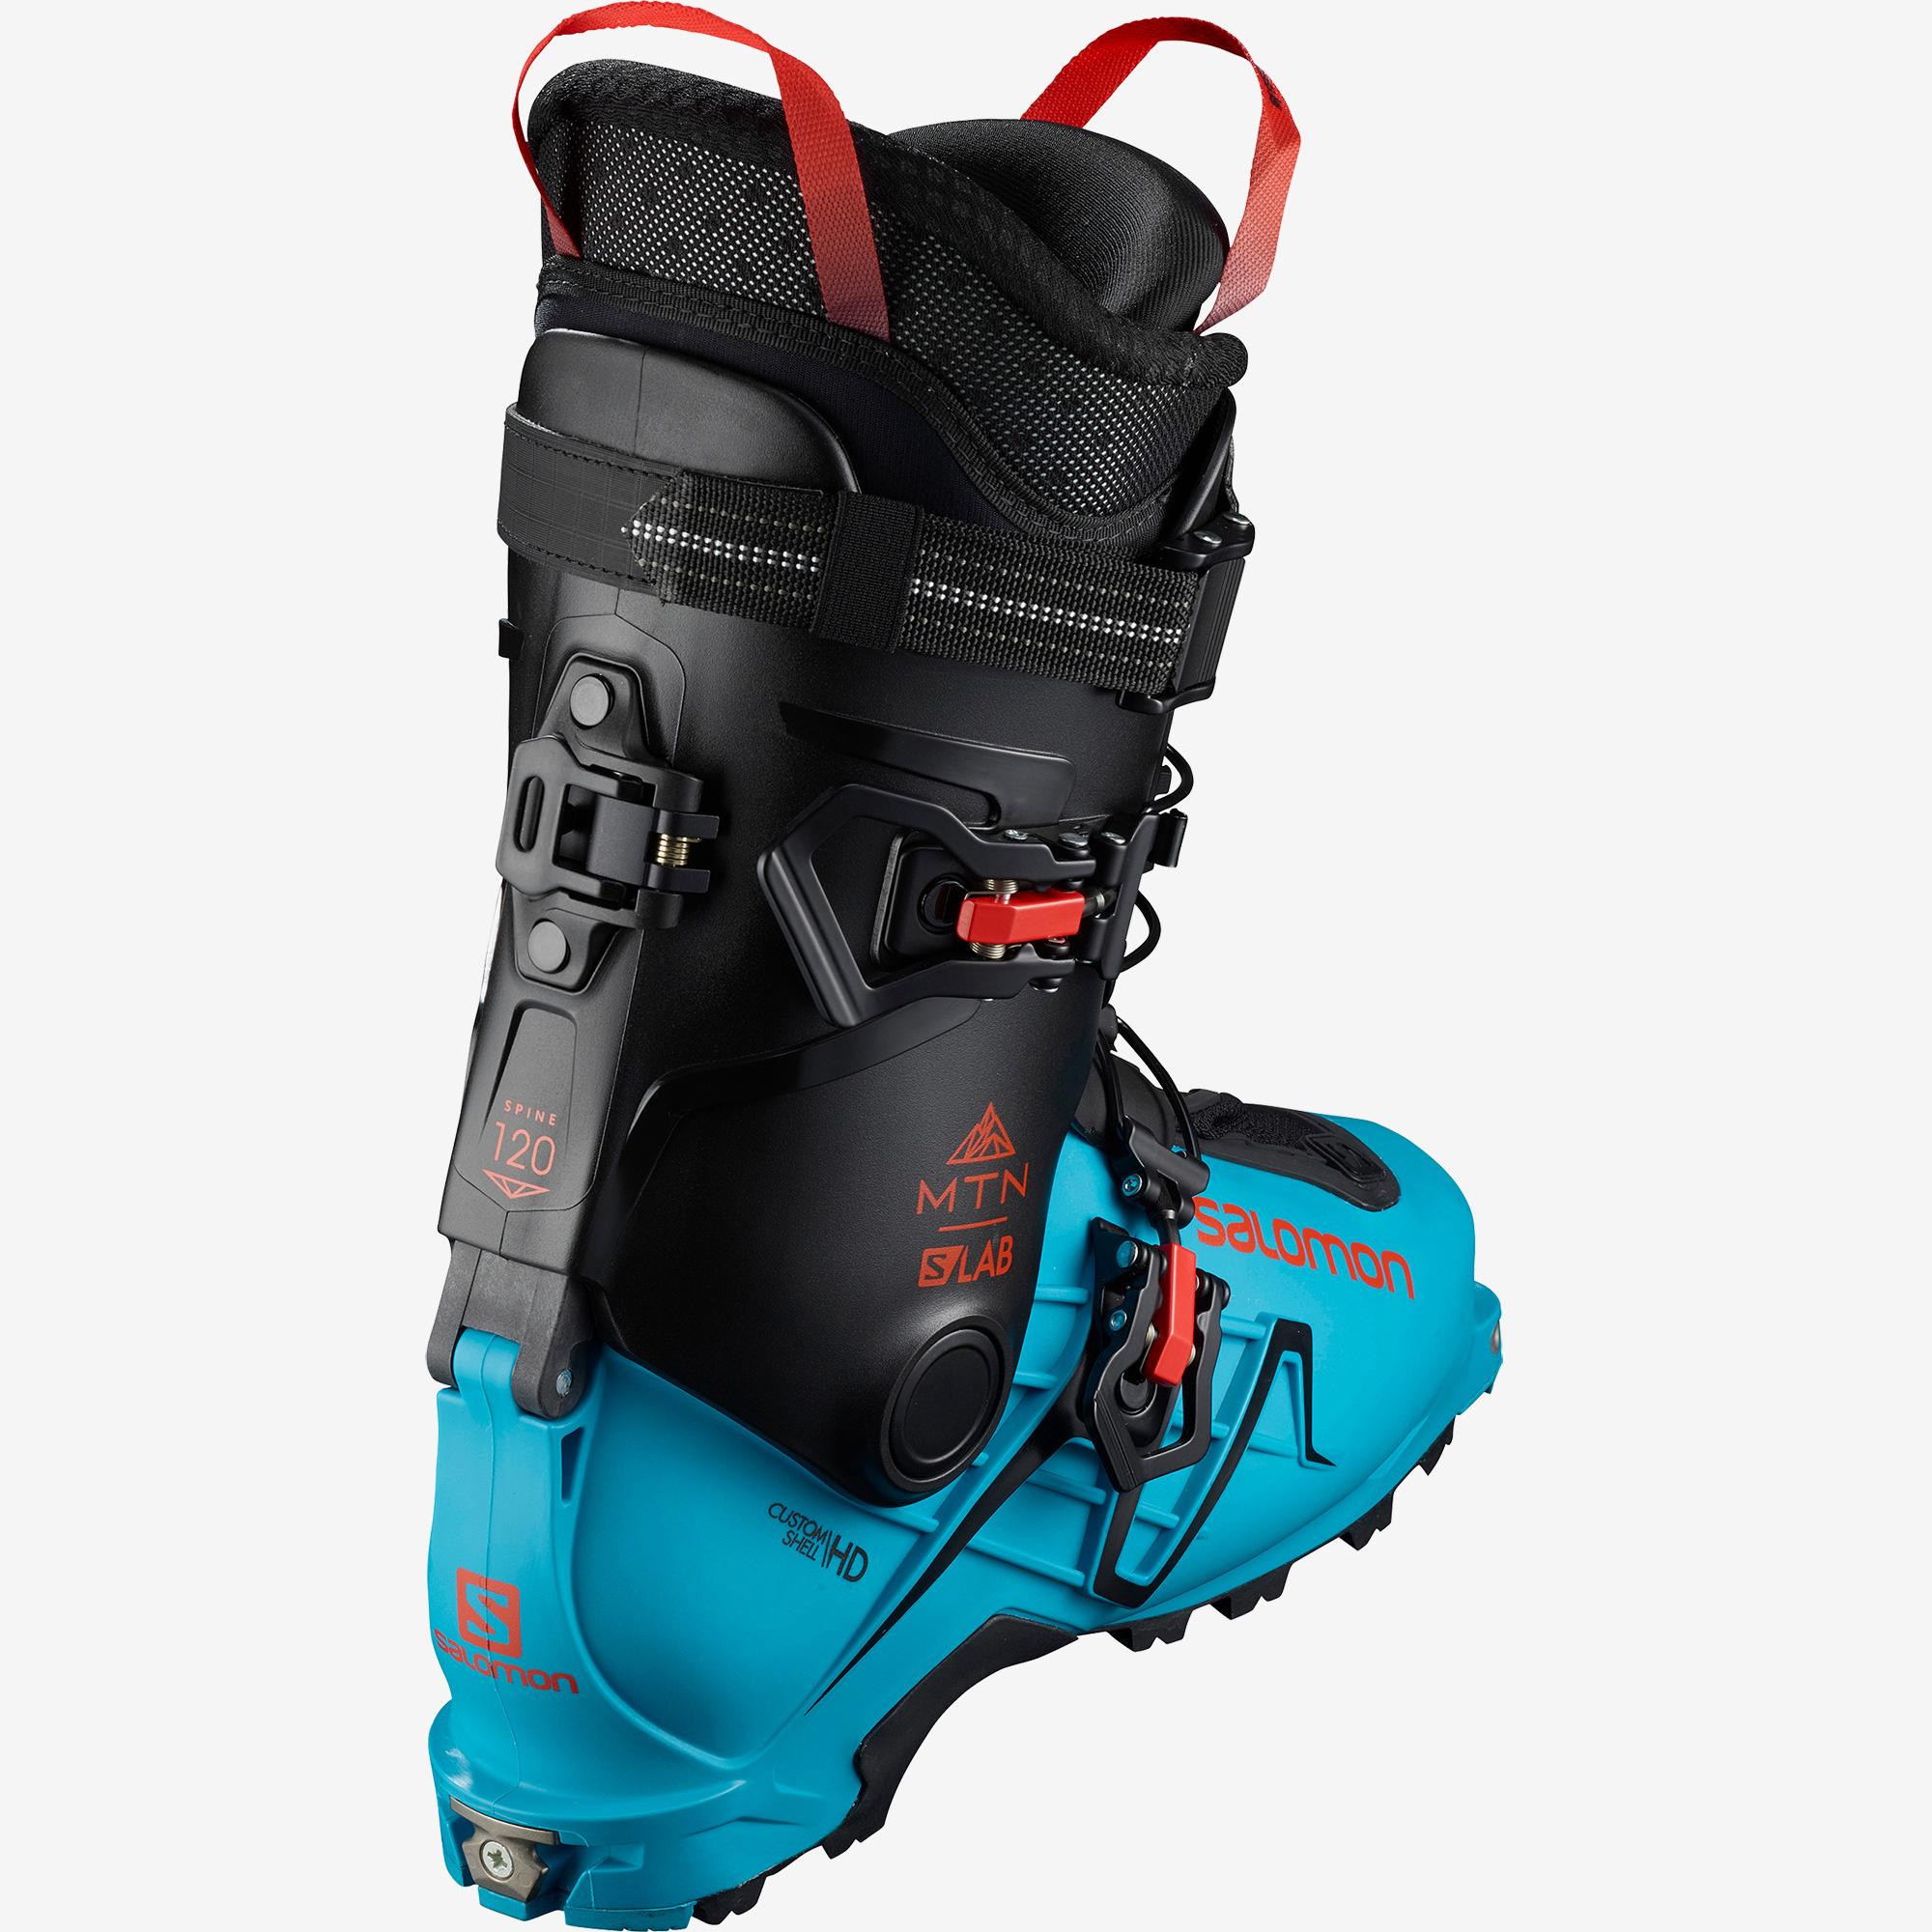 S/LAB MTN Boot-2